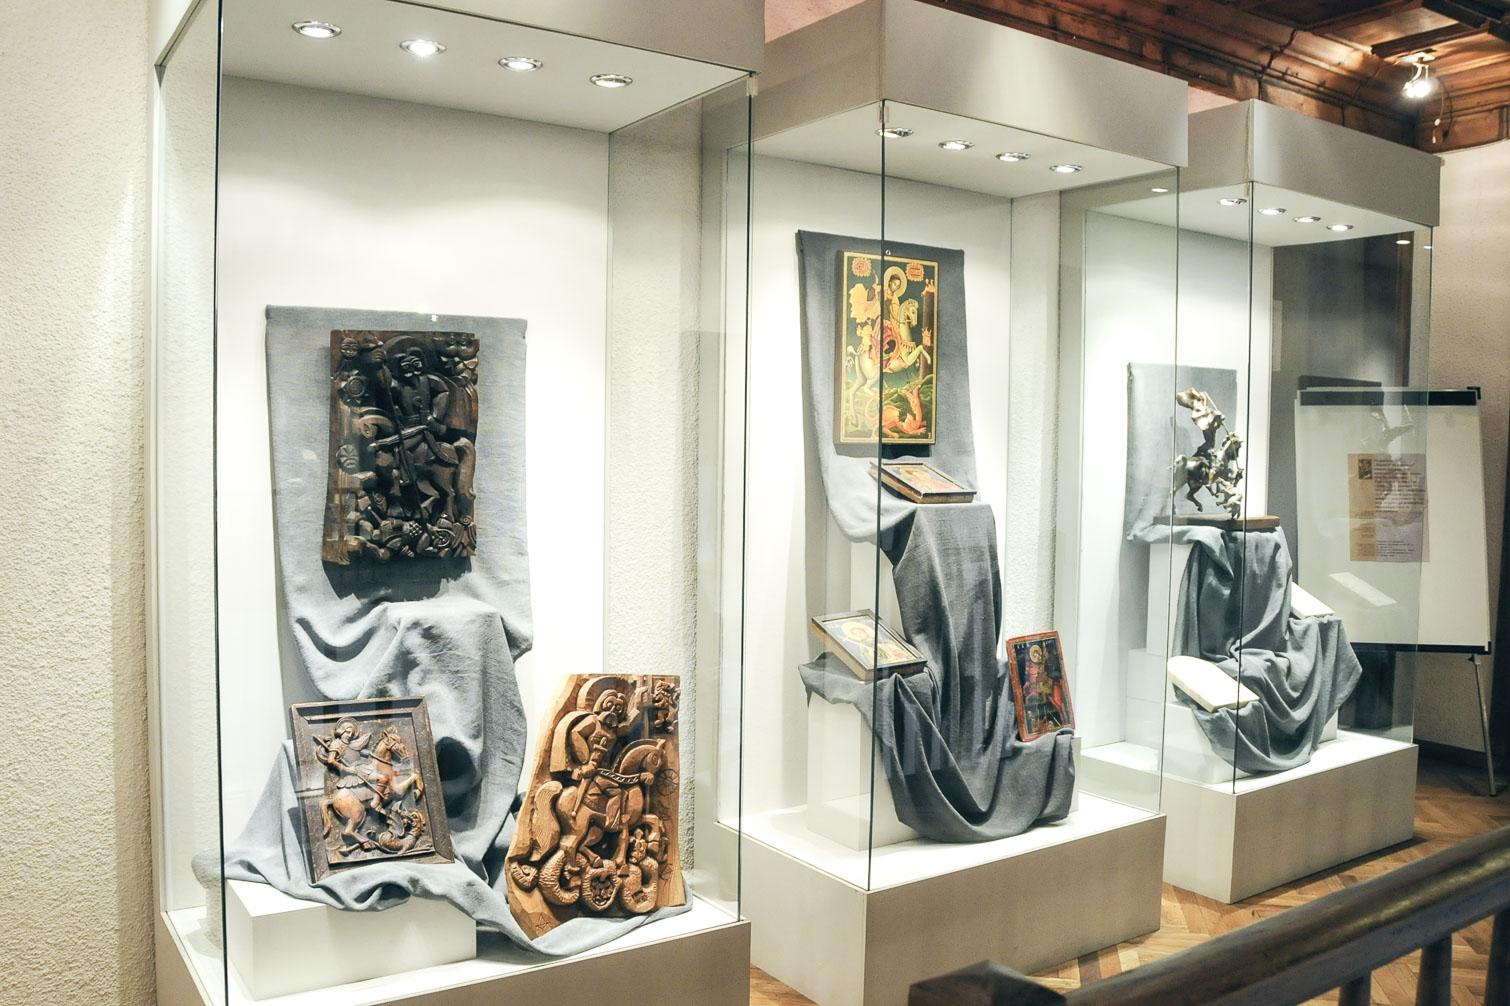 troyan-museum-jivotat-na-edna-idea-40